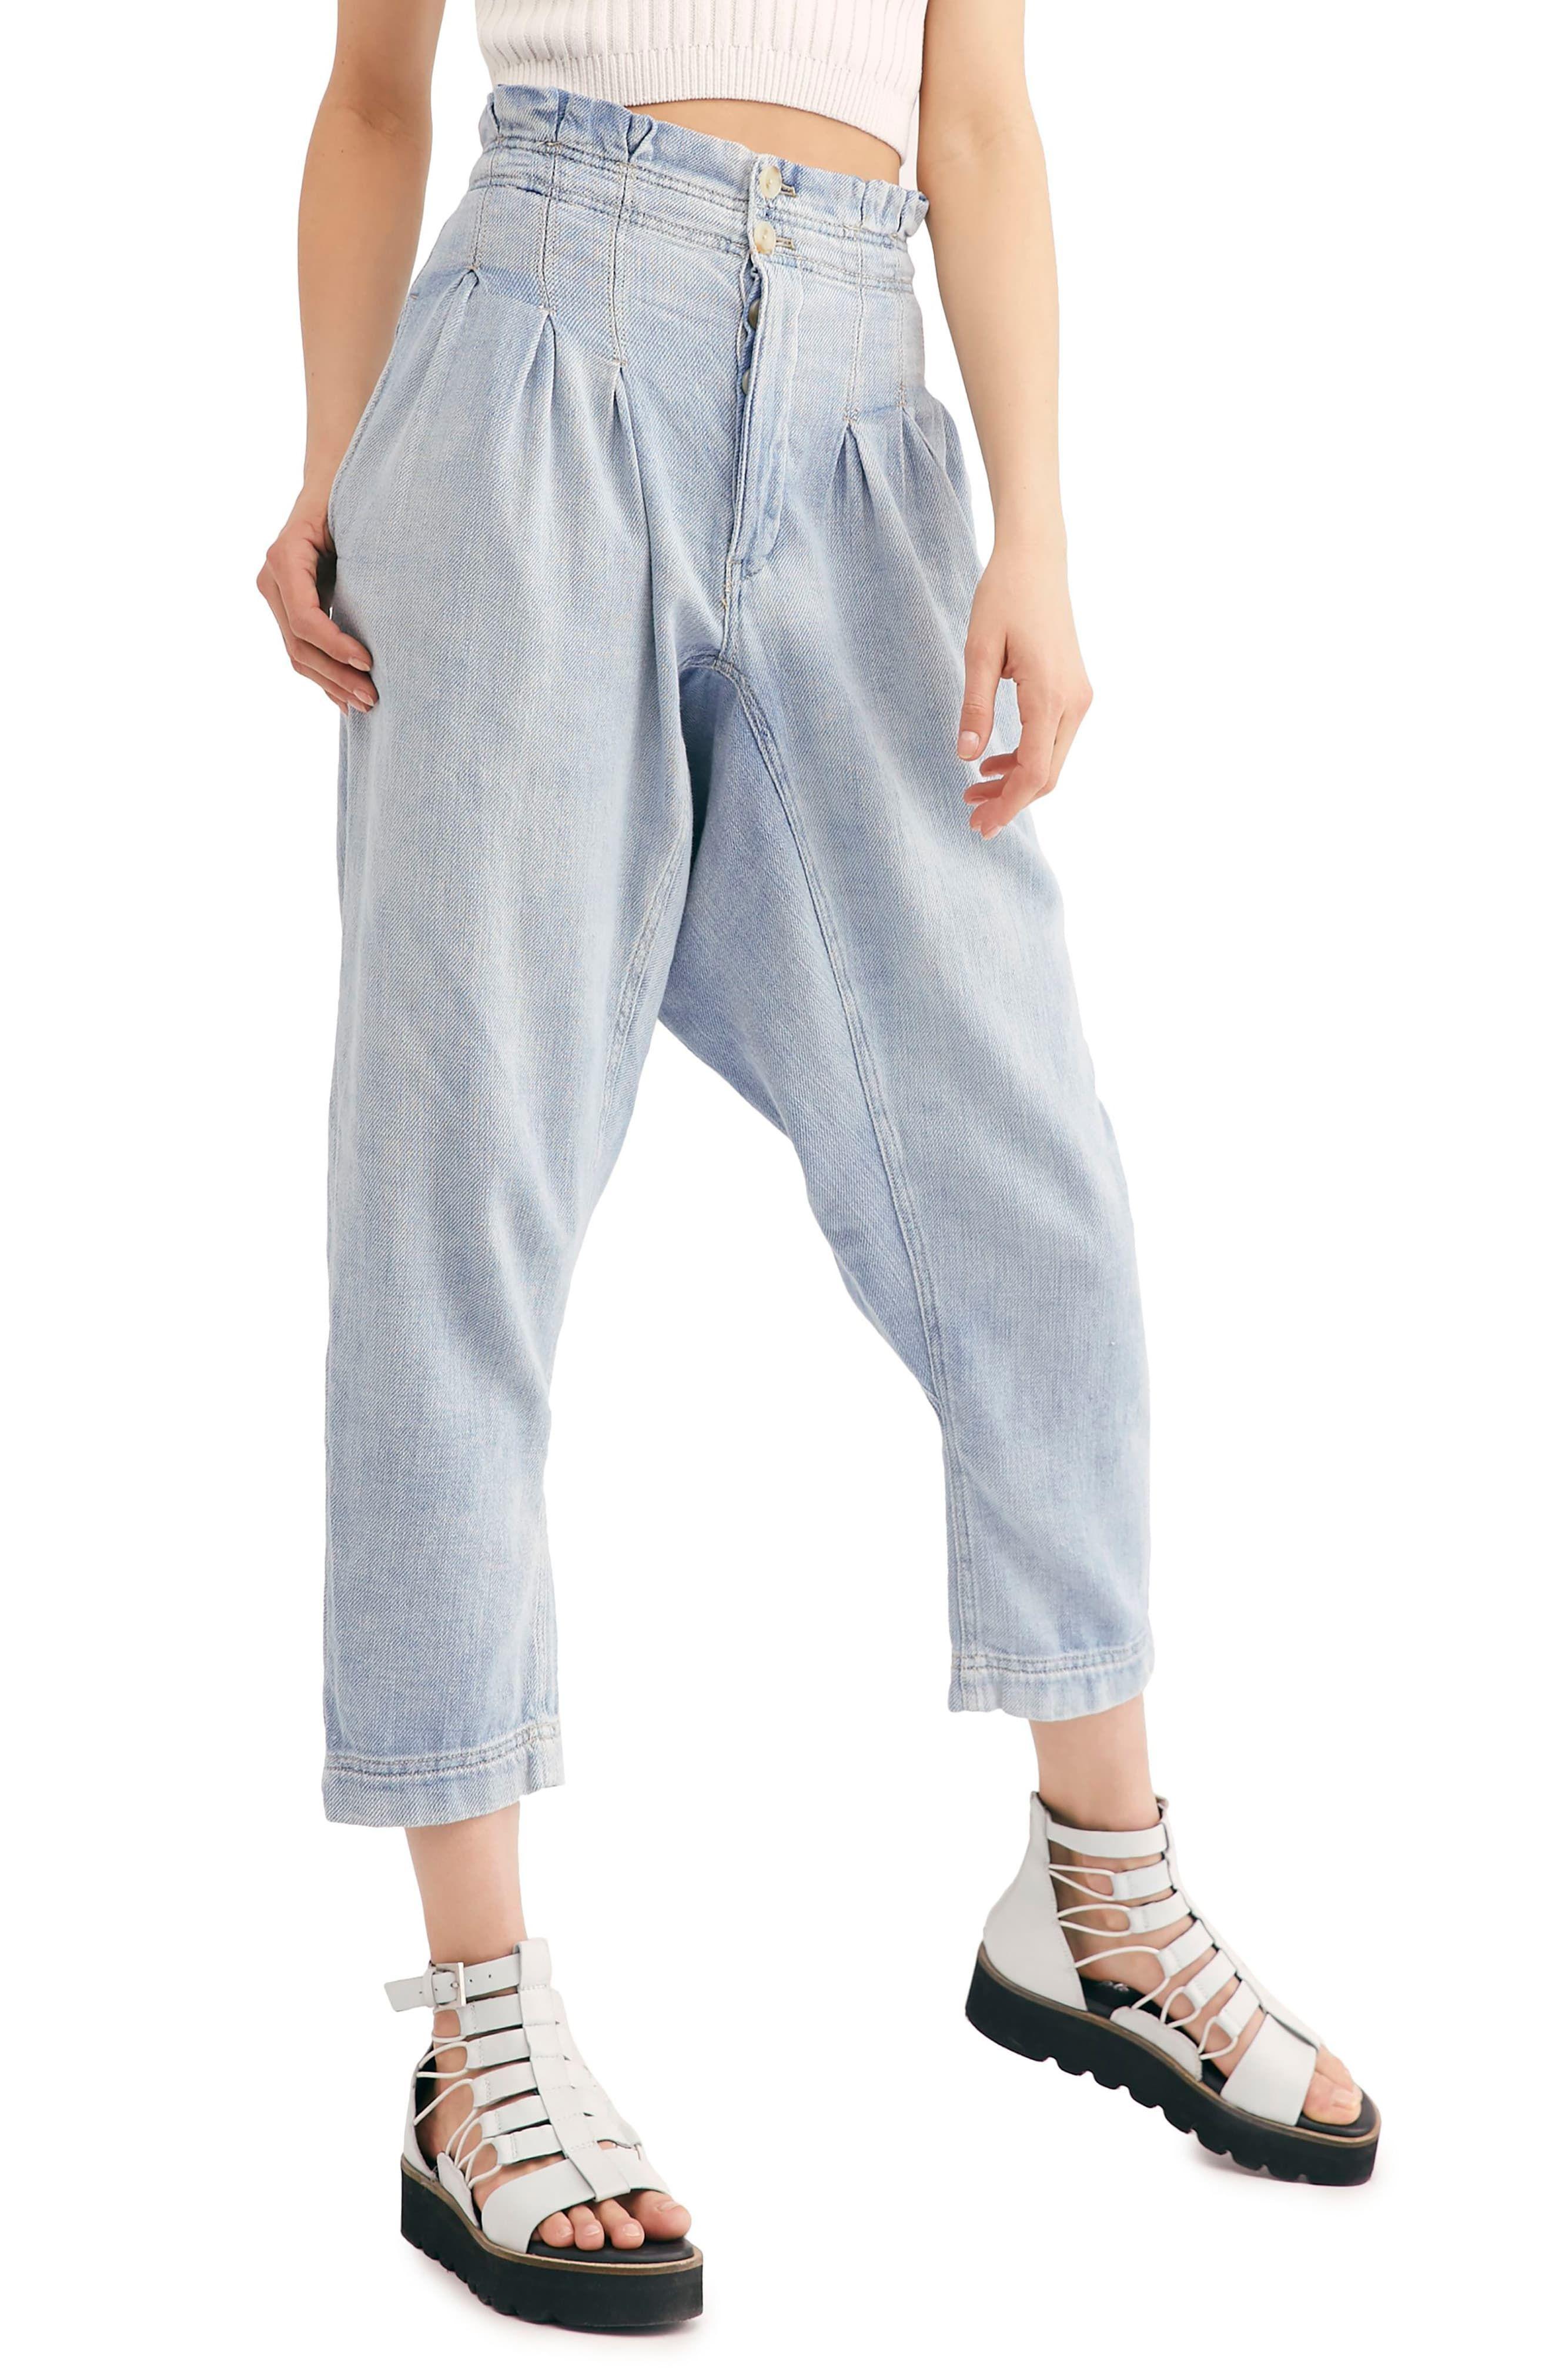 Free People Mover & Shaker Tapered Crop Denim Pants | Denim